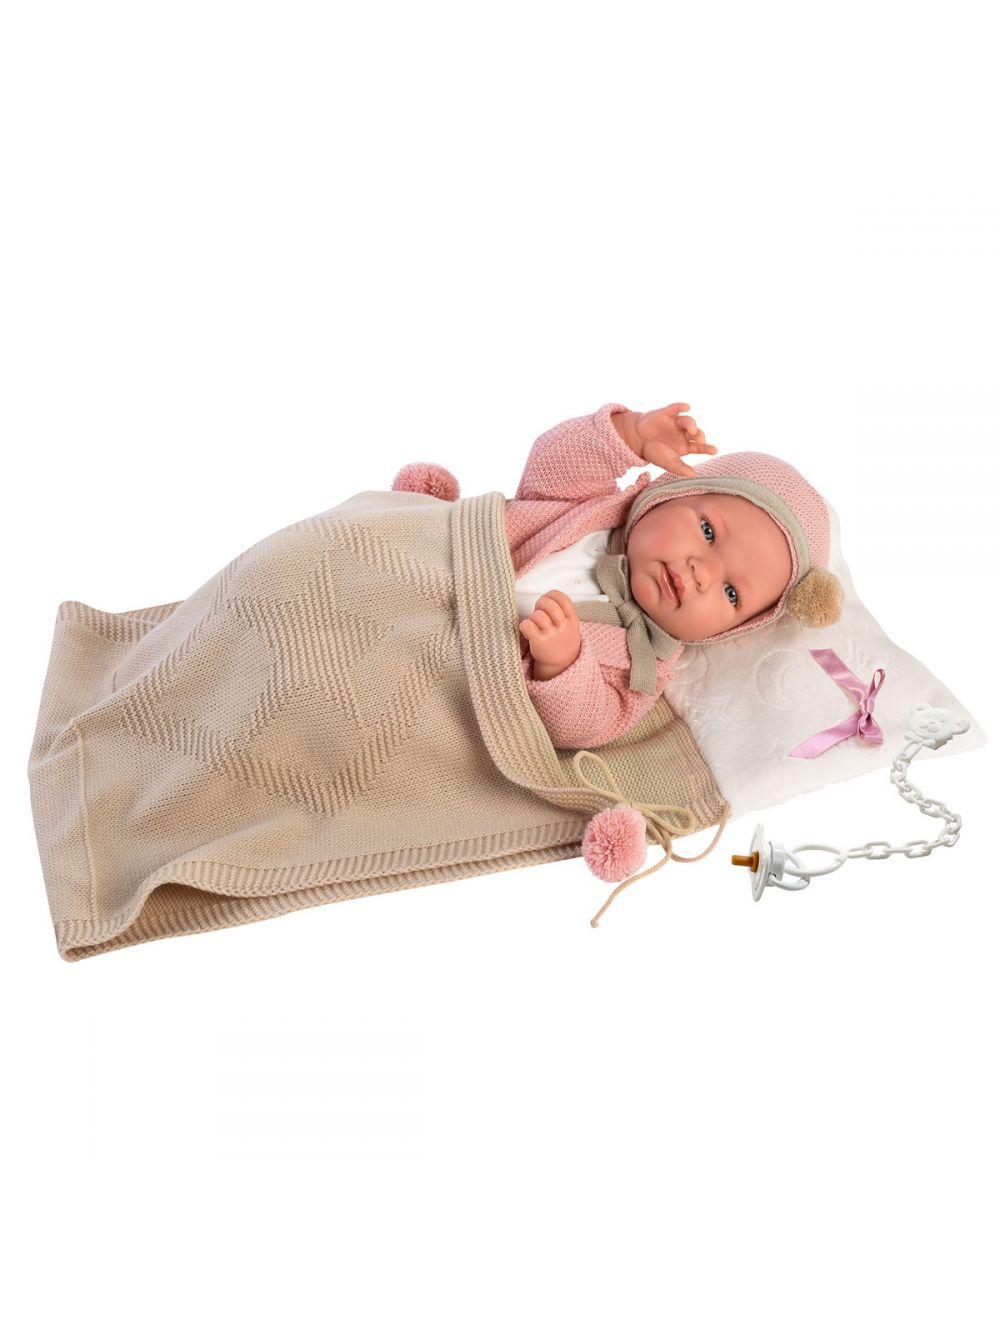 Llorens 84318 Lalka bobas Tina 43 cm w różowym sweterku FB